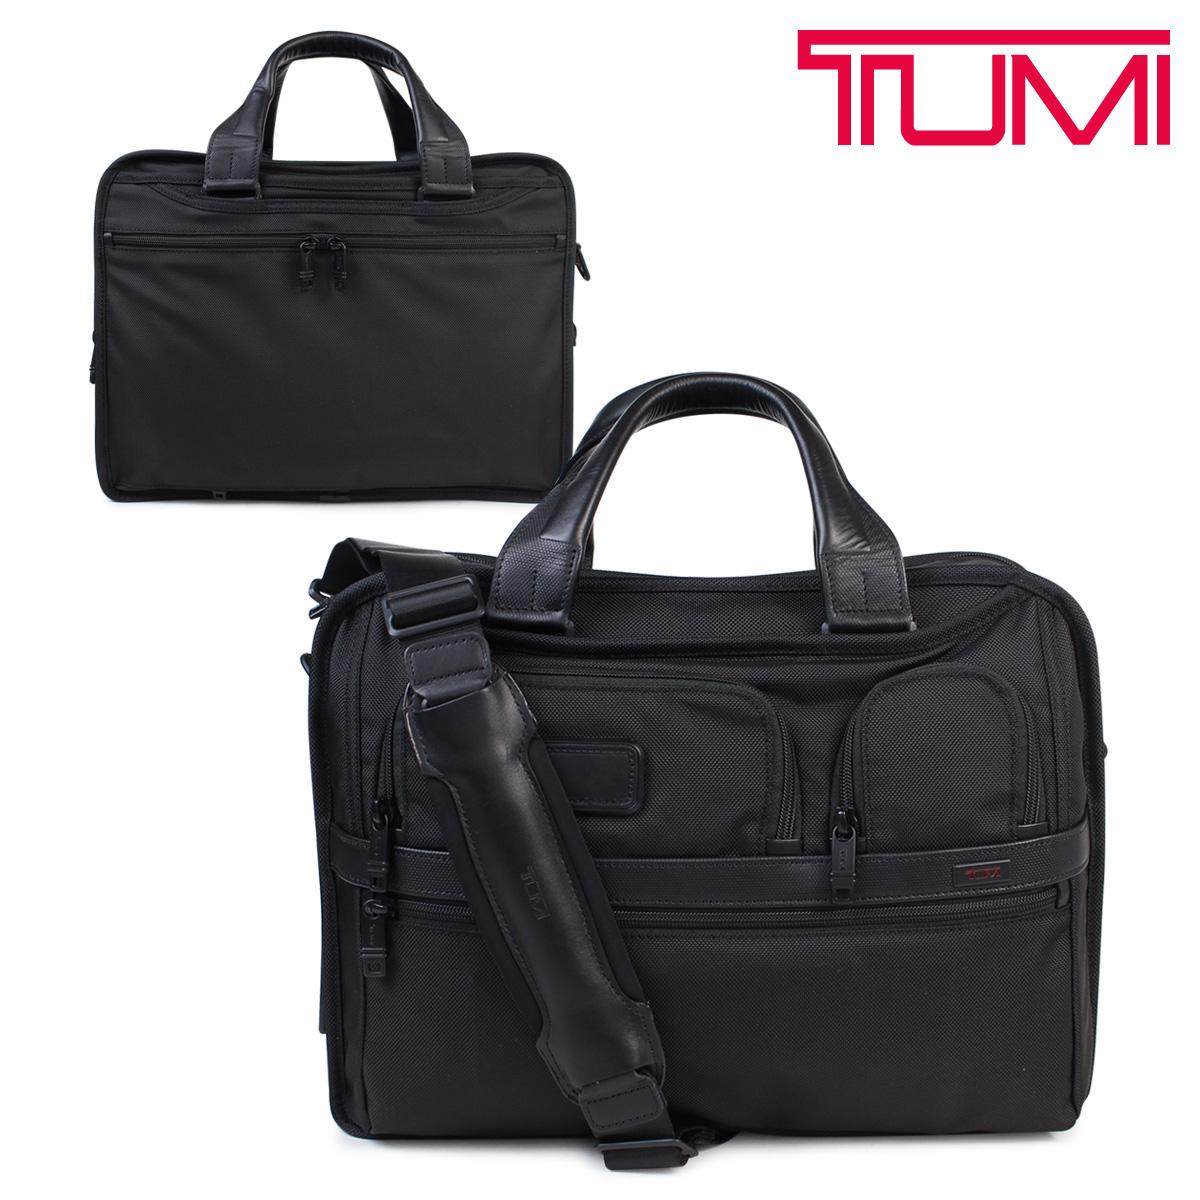 TUMI EXPANDABLE ORGANIZER COMPUTER BRIEF トゥミ ビジネス バッグ メンズ 026141D2 ALPHA2 ブリーフケース